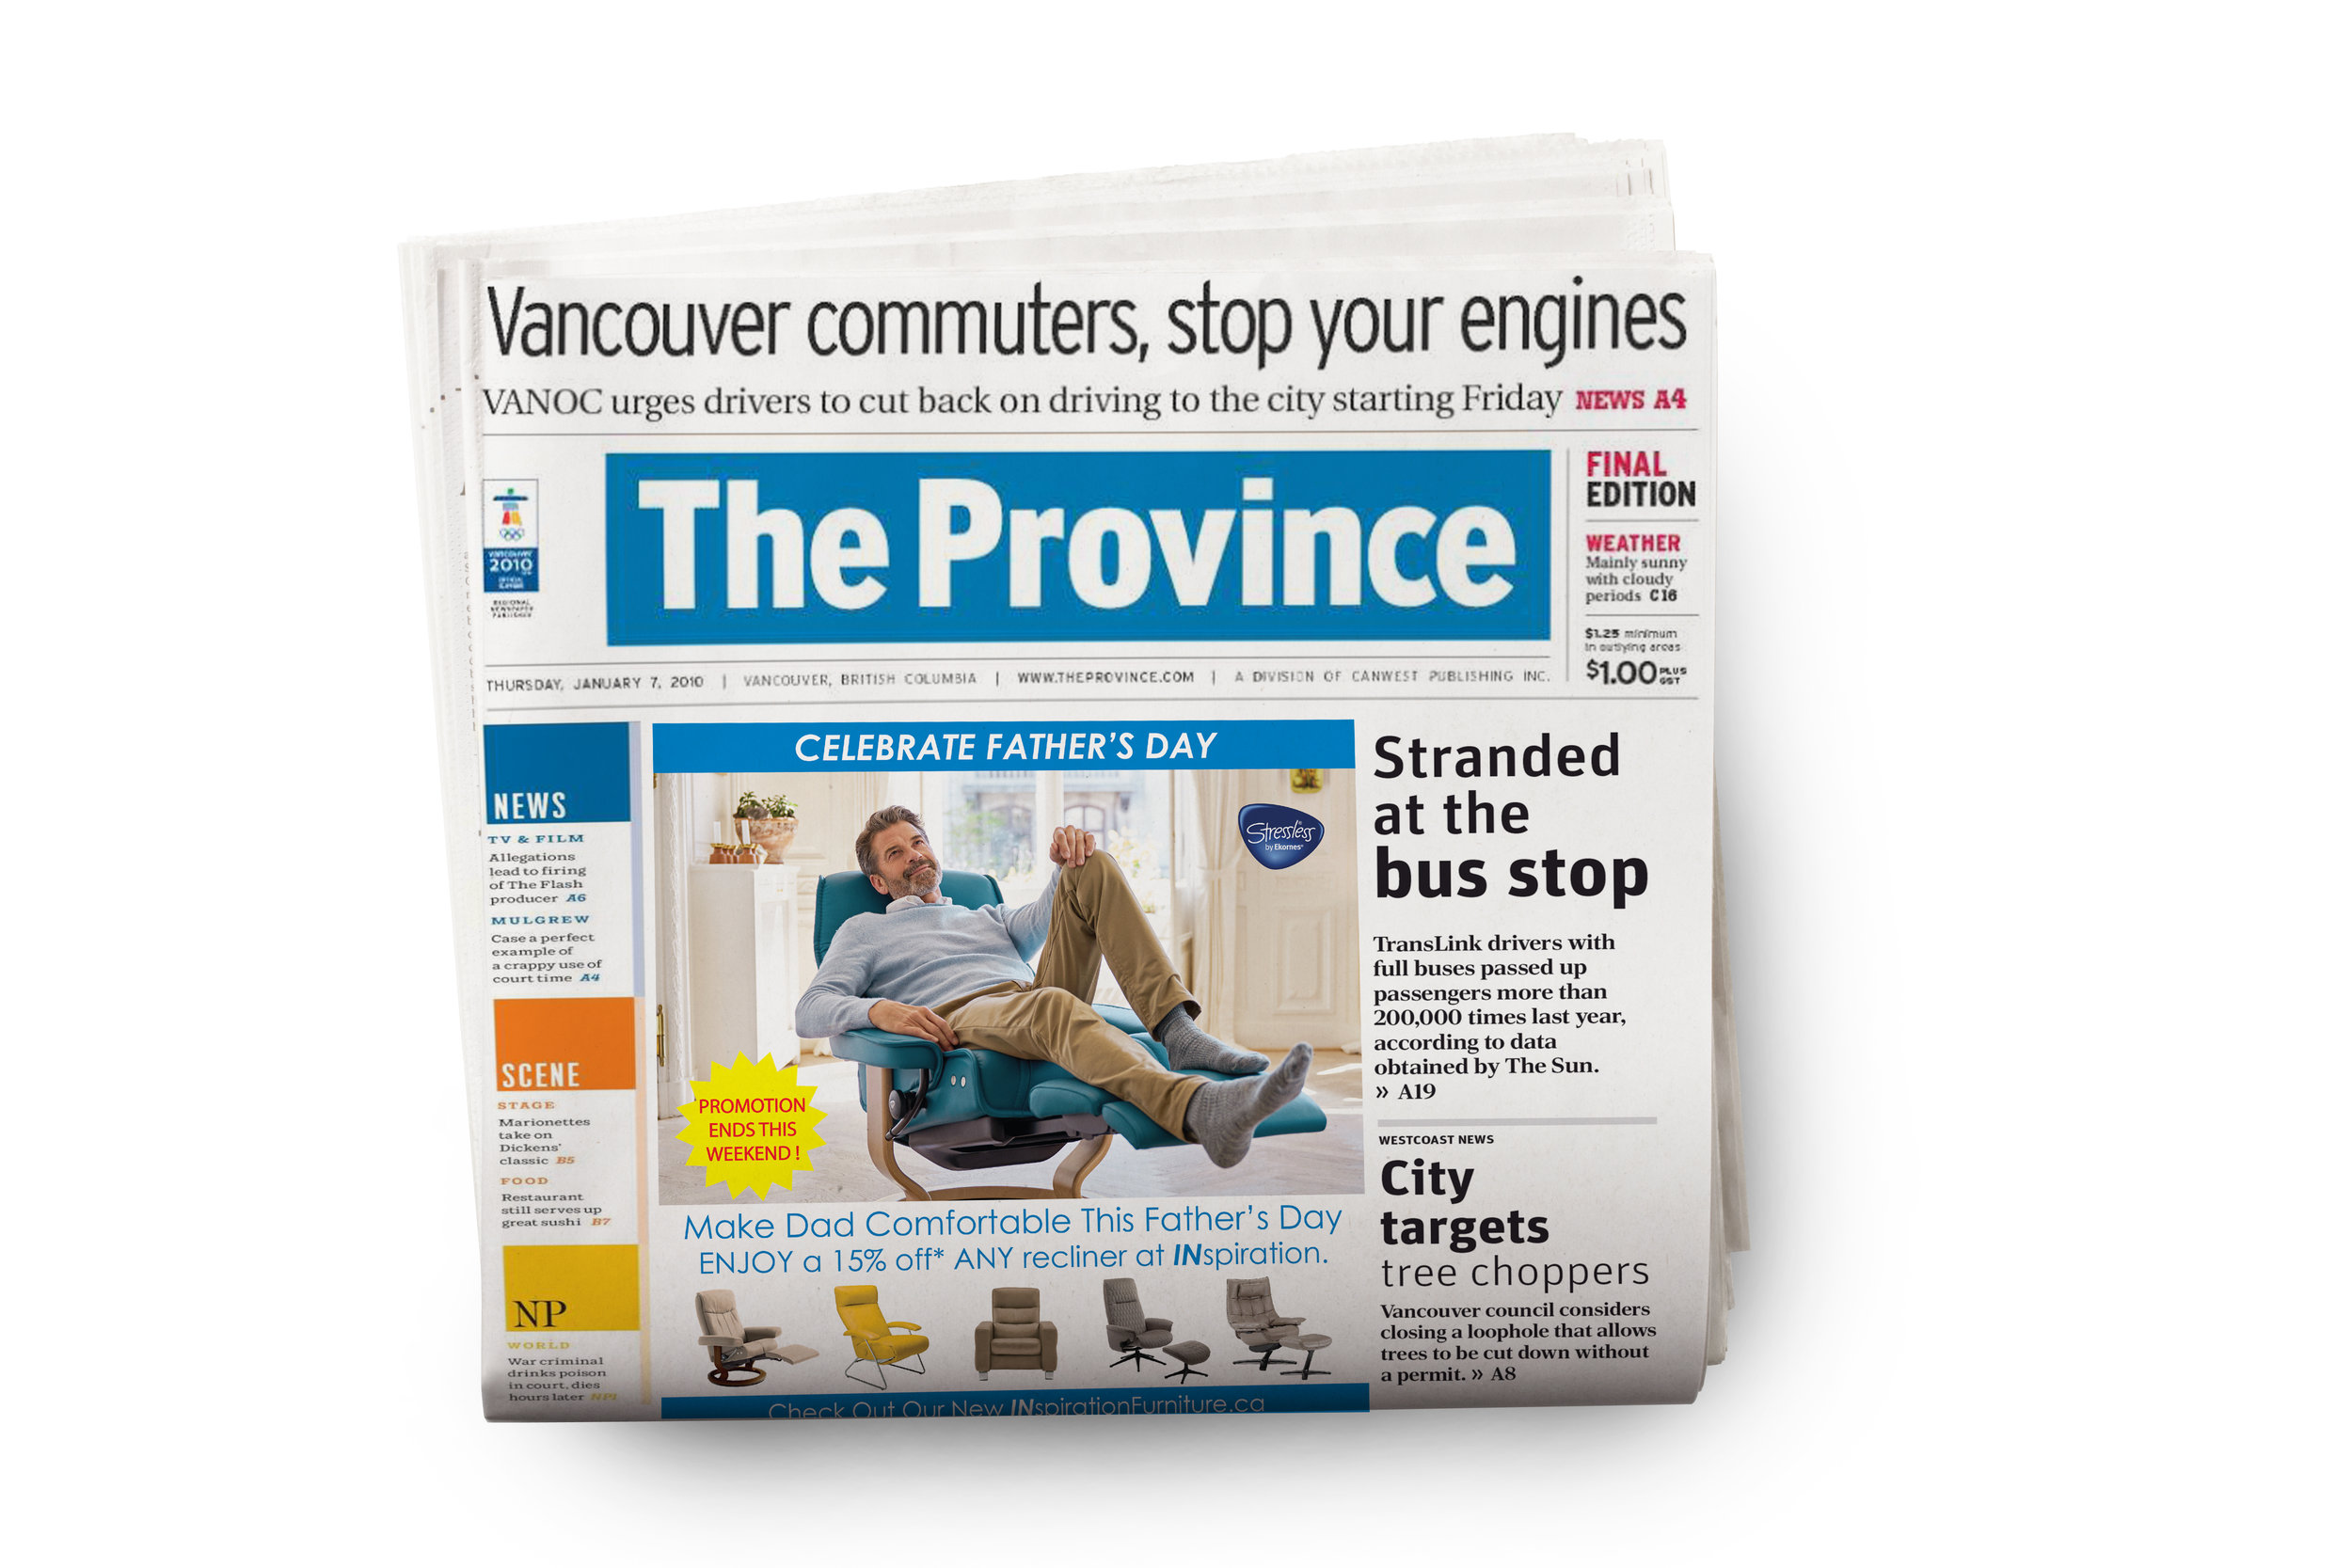 IN_Province_Newspaper14.jpg